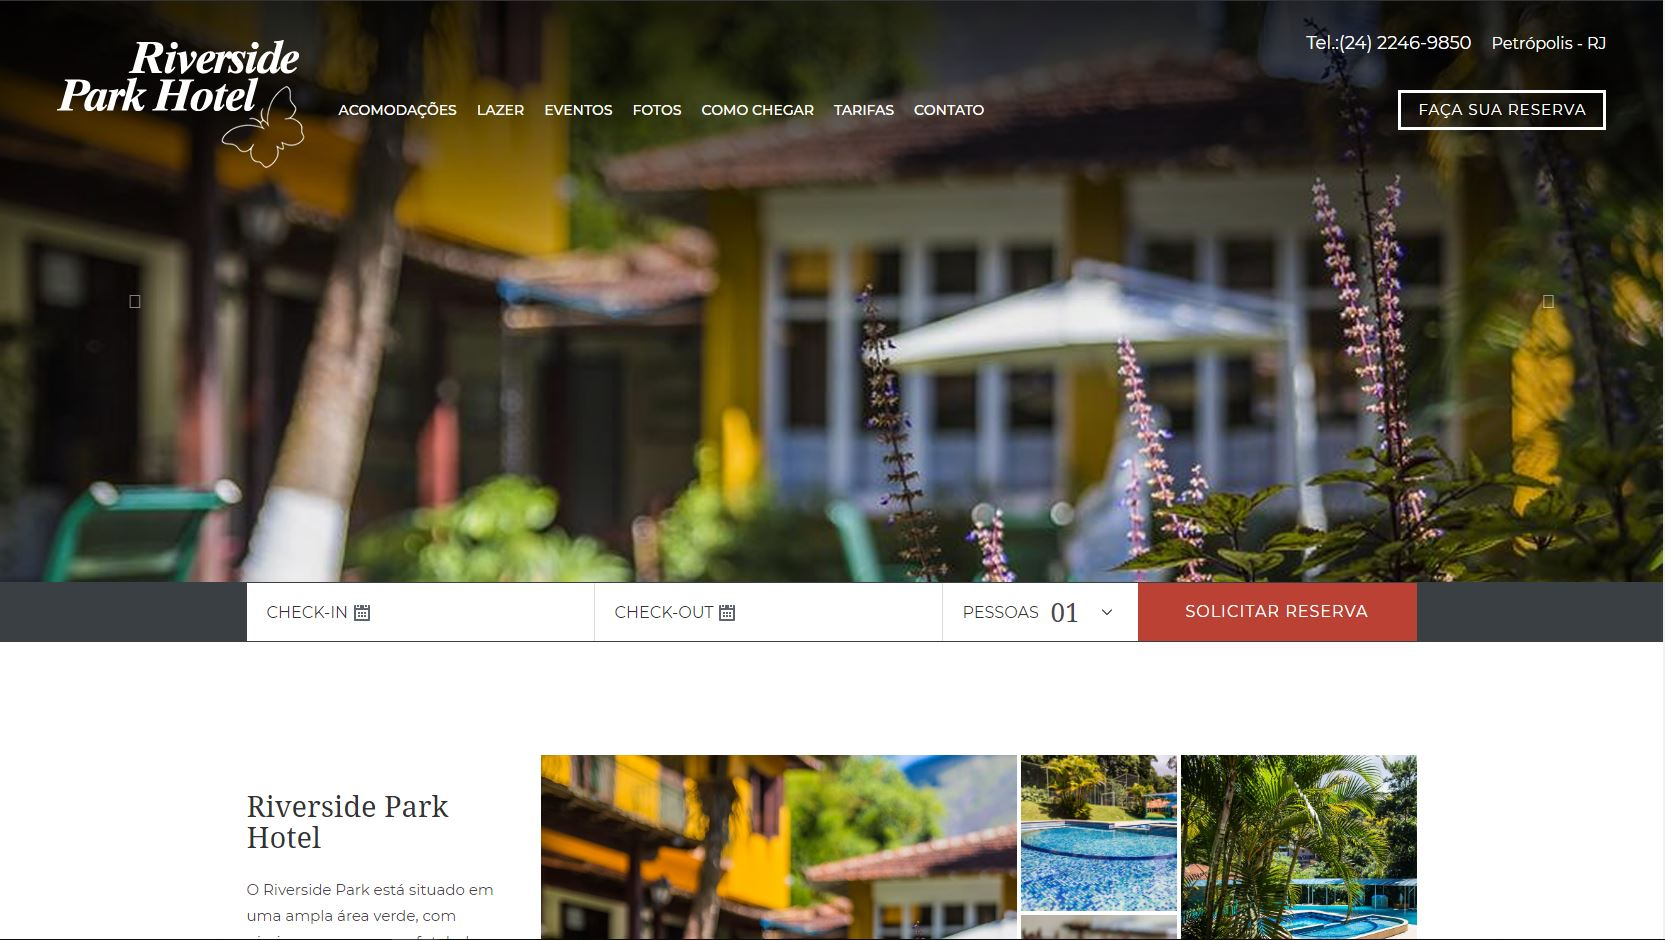 Riverside Park Hotel